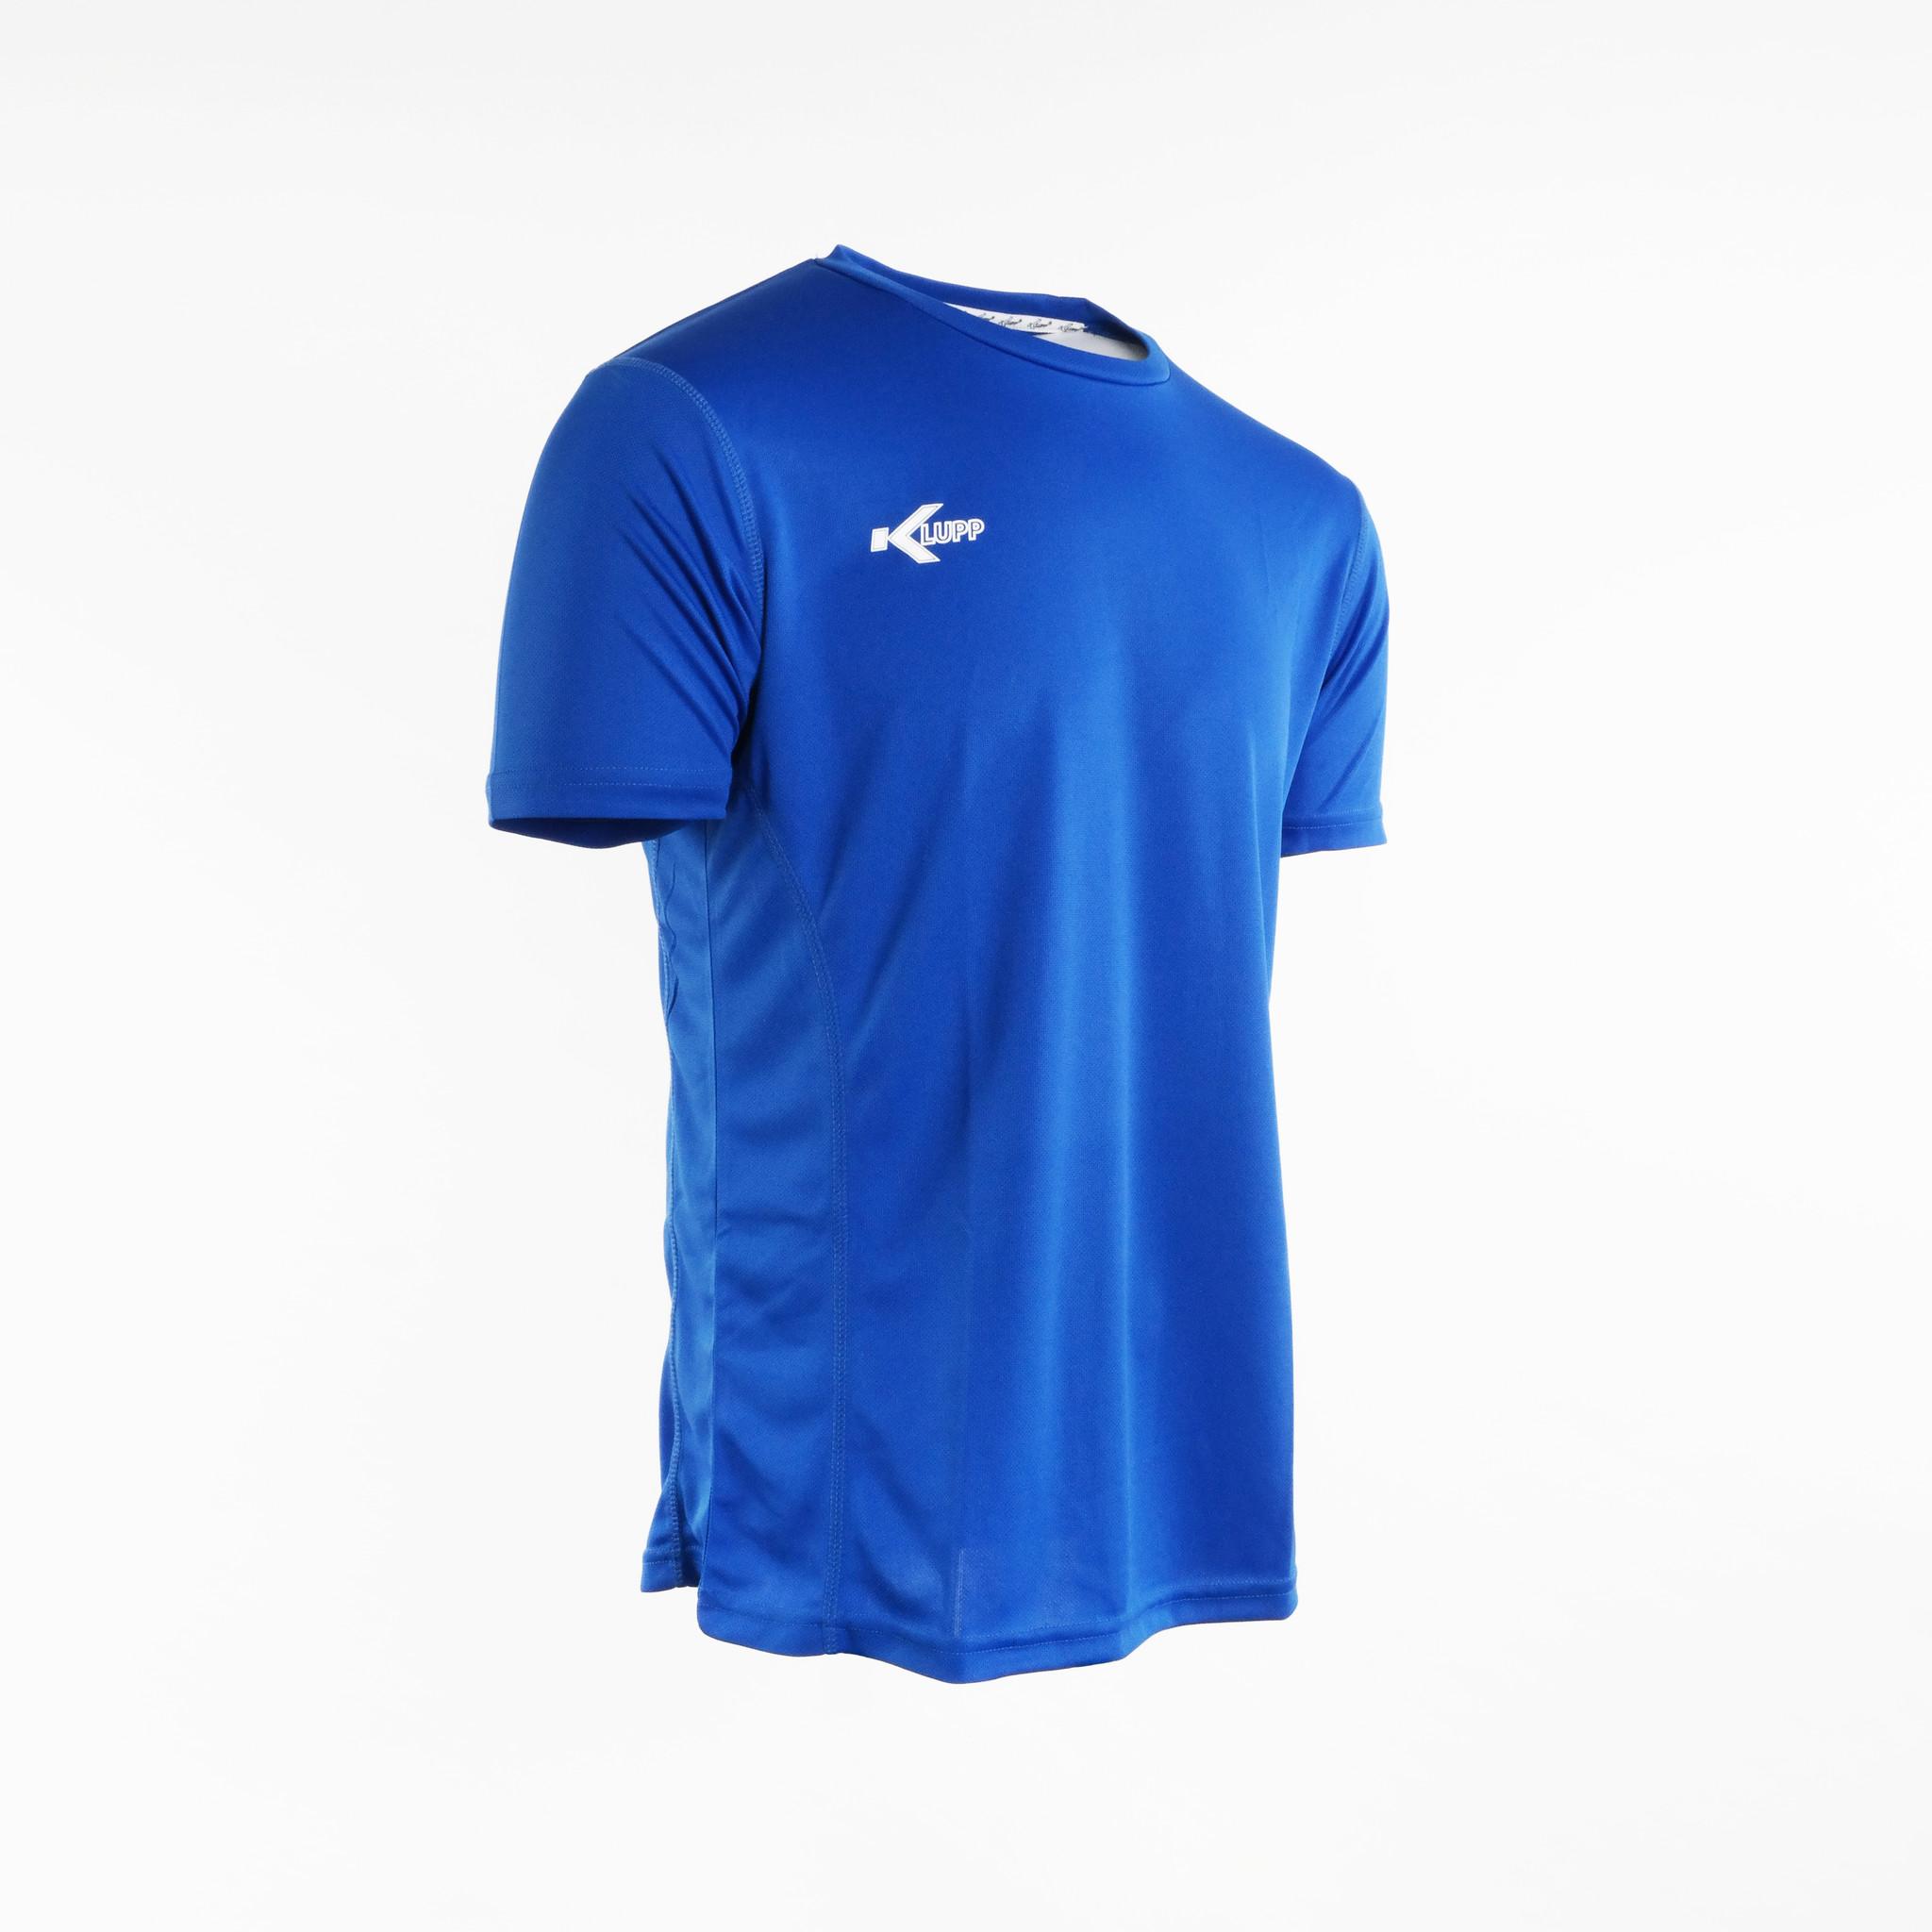 Klupp Original Shirt - Royal Blauw